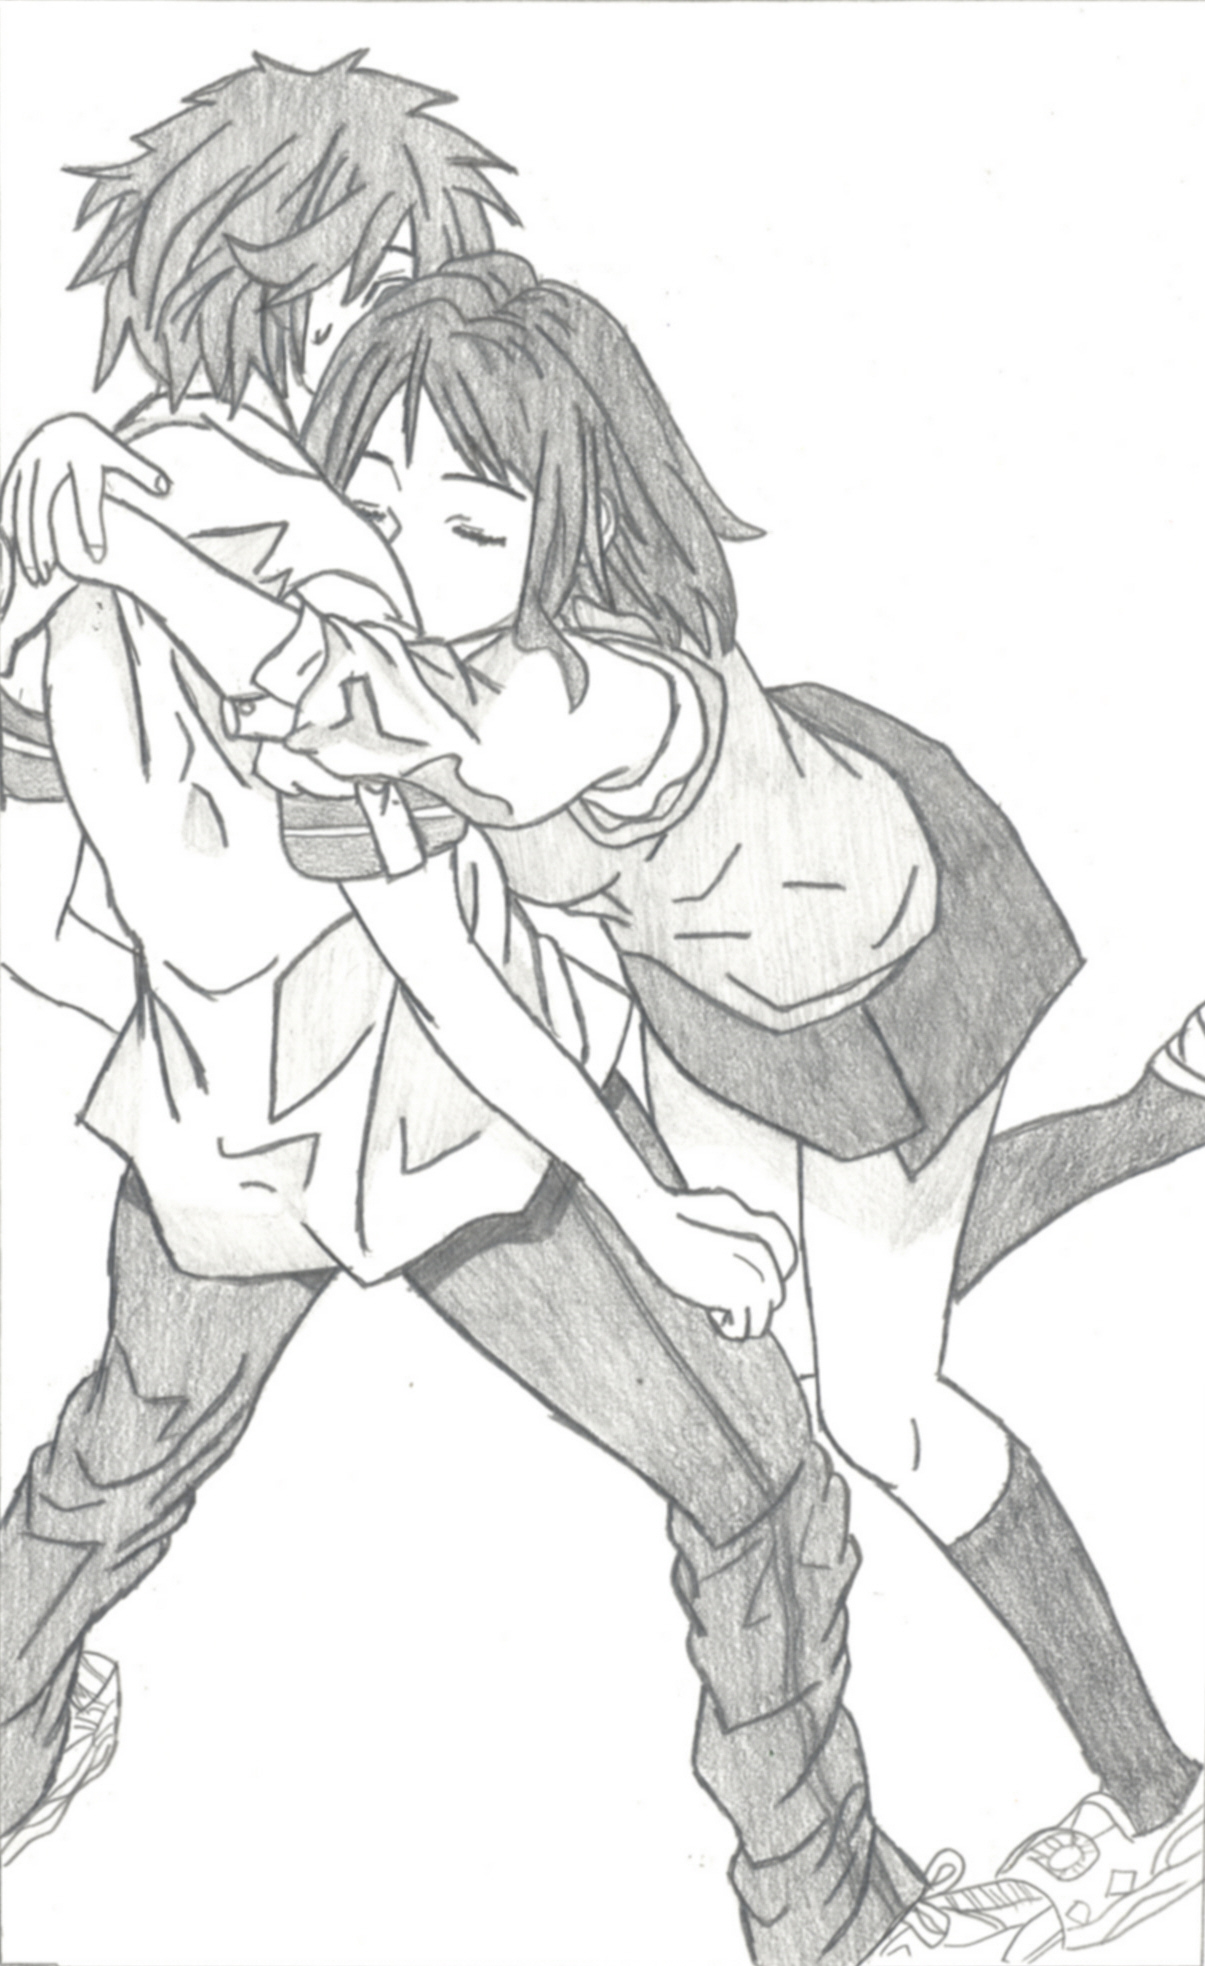 Friendly hug by salangley on deviantart